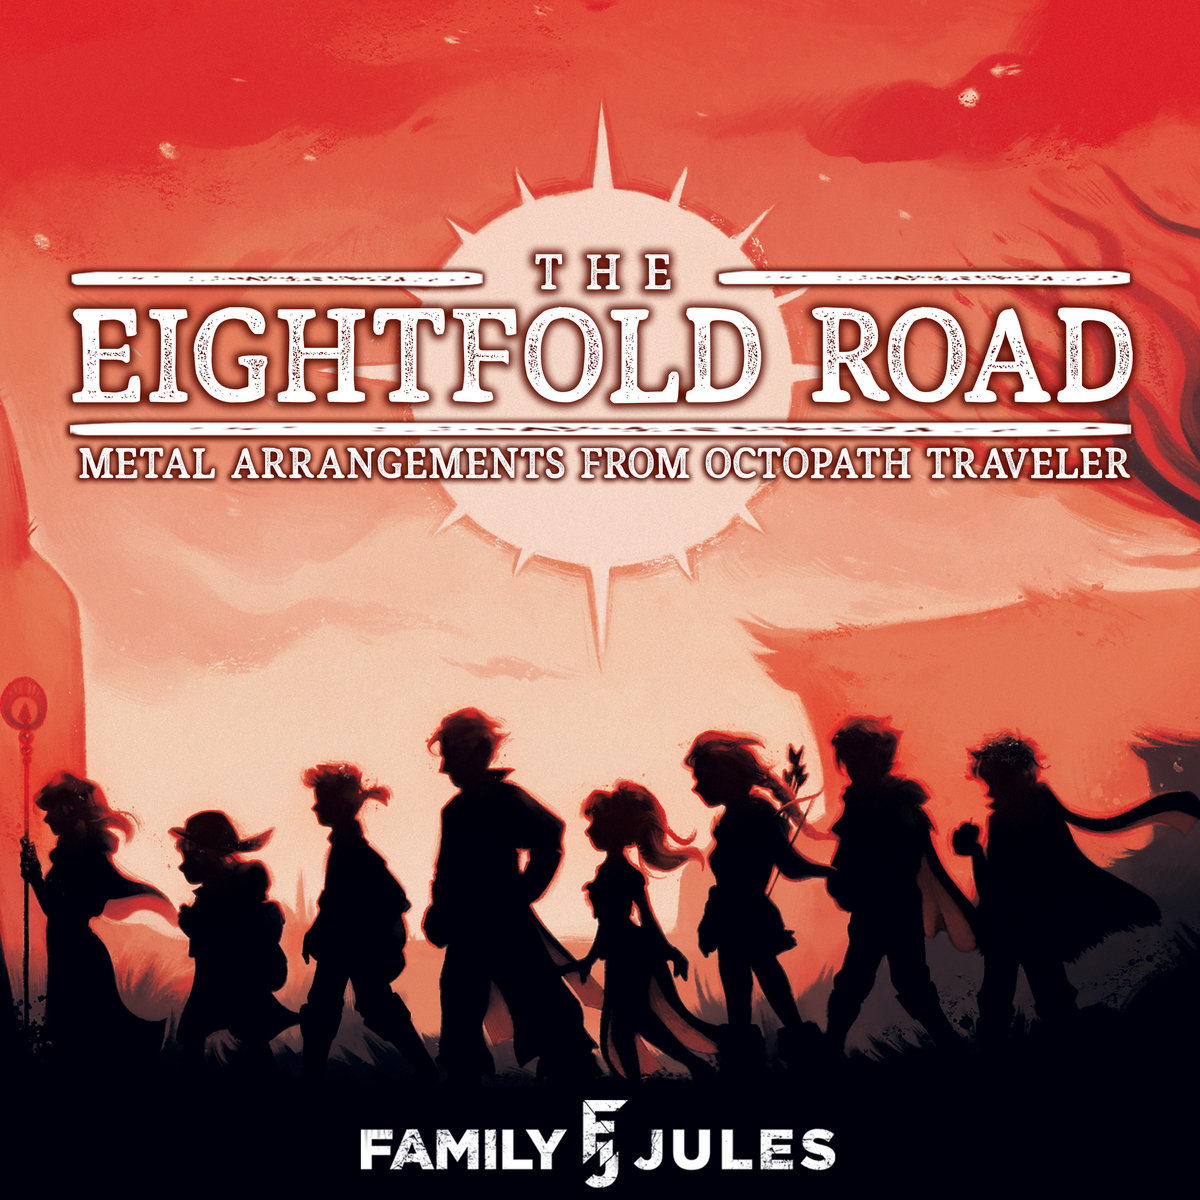 The Eightfold Road: Metal Arrangements from Octopath Traveler